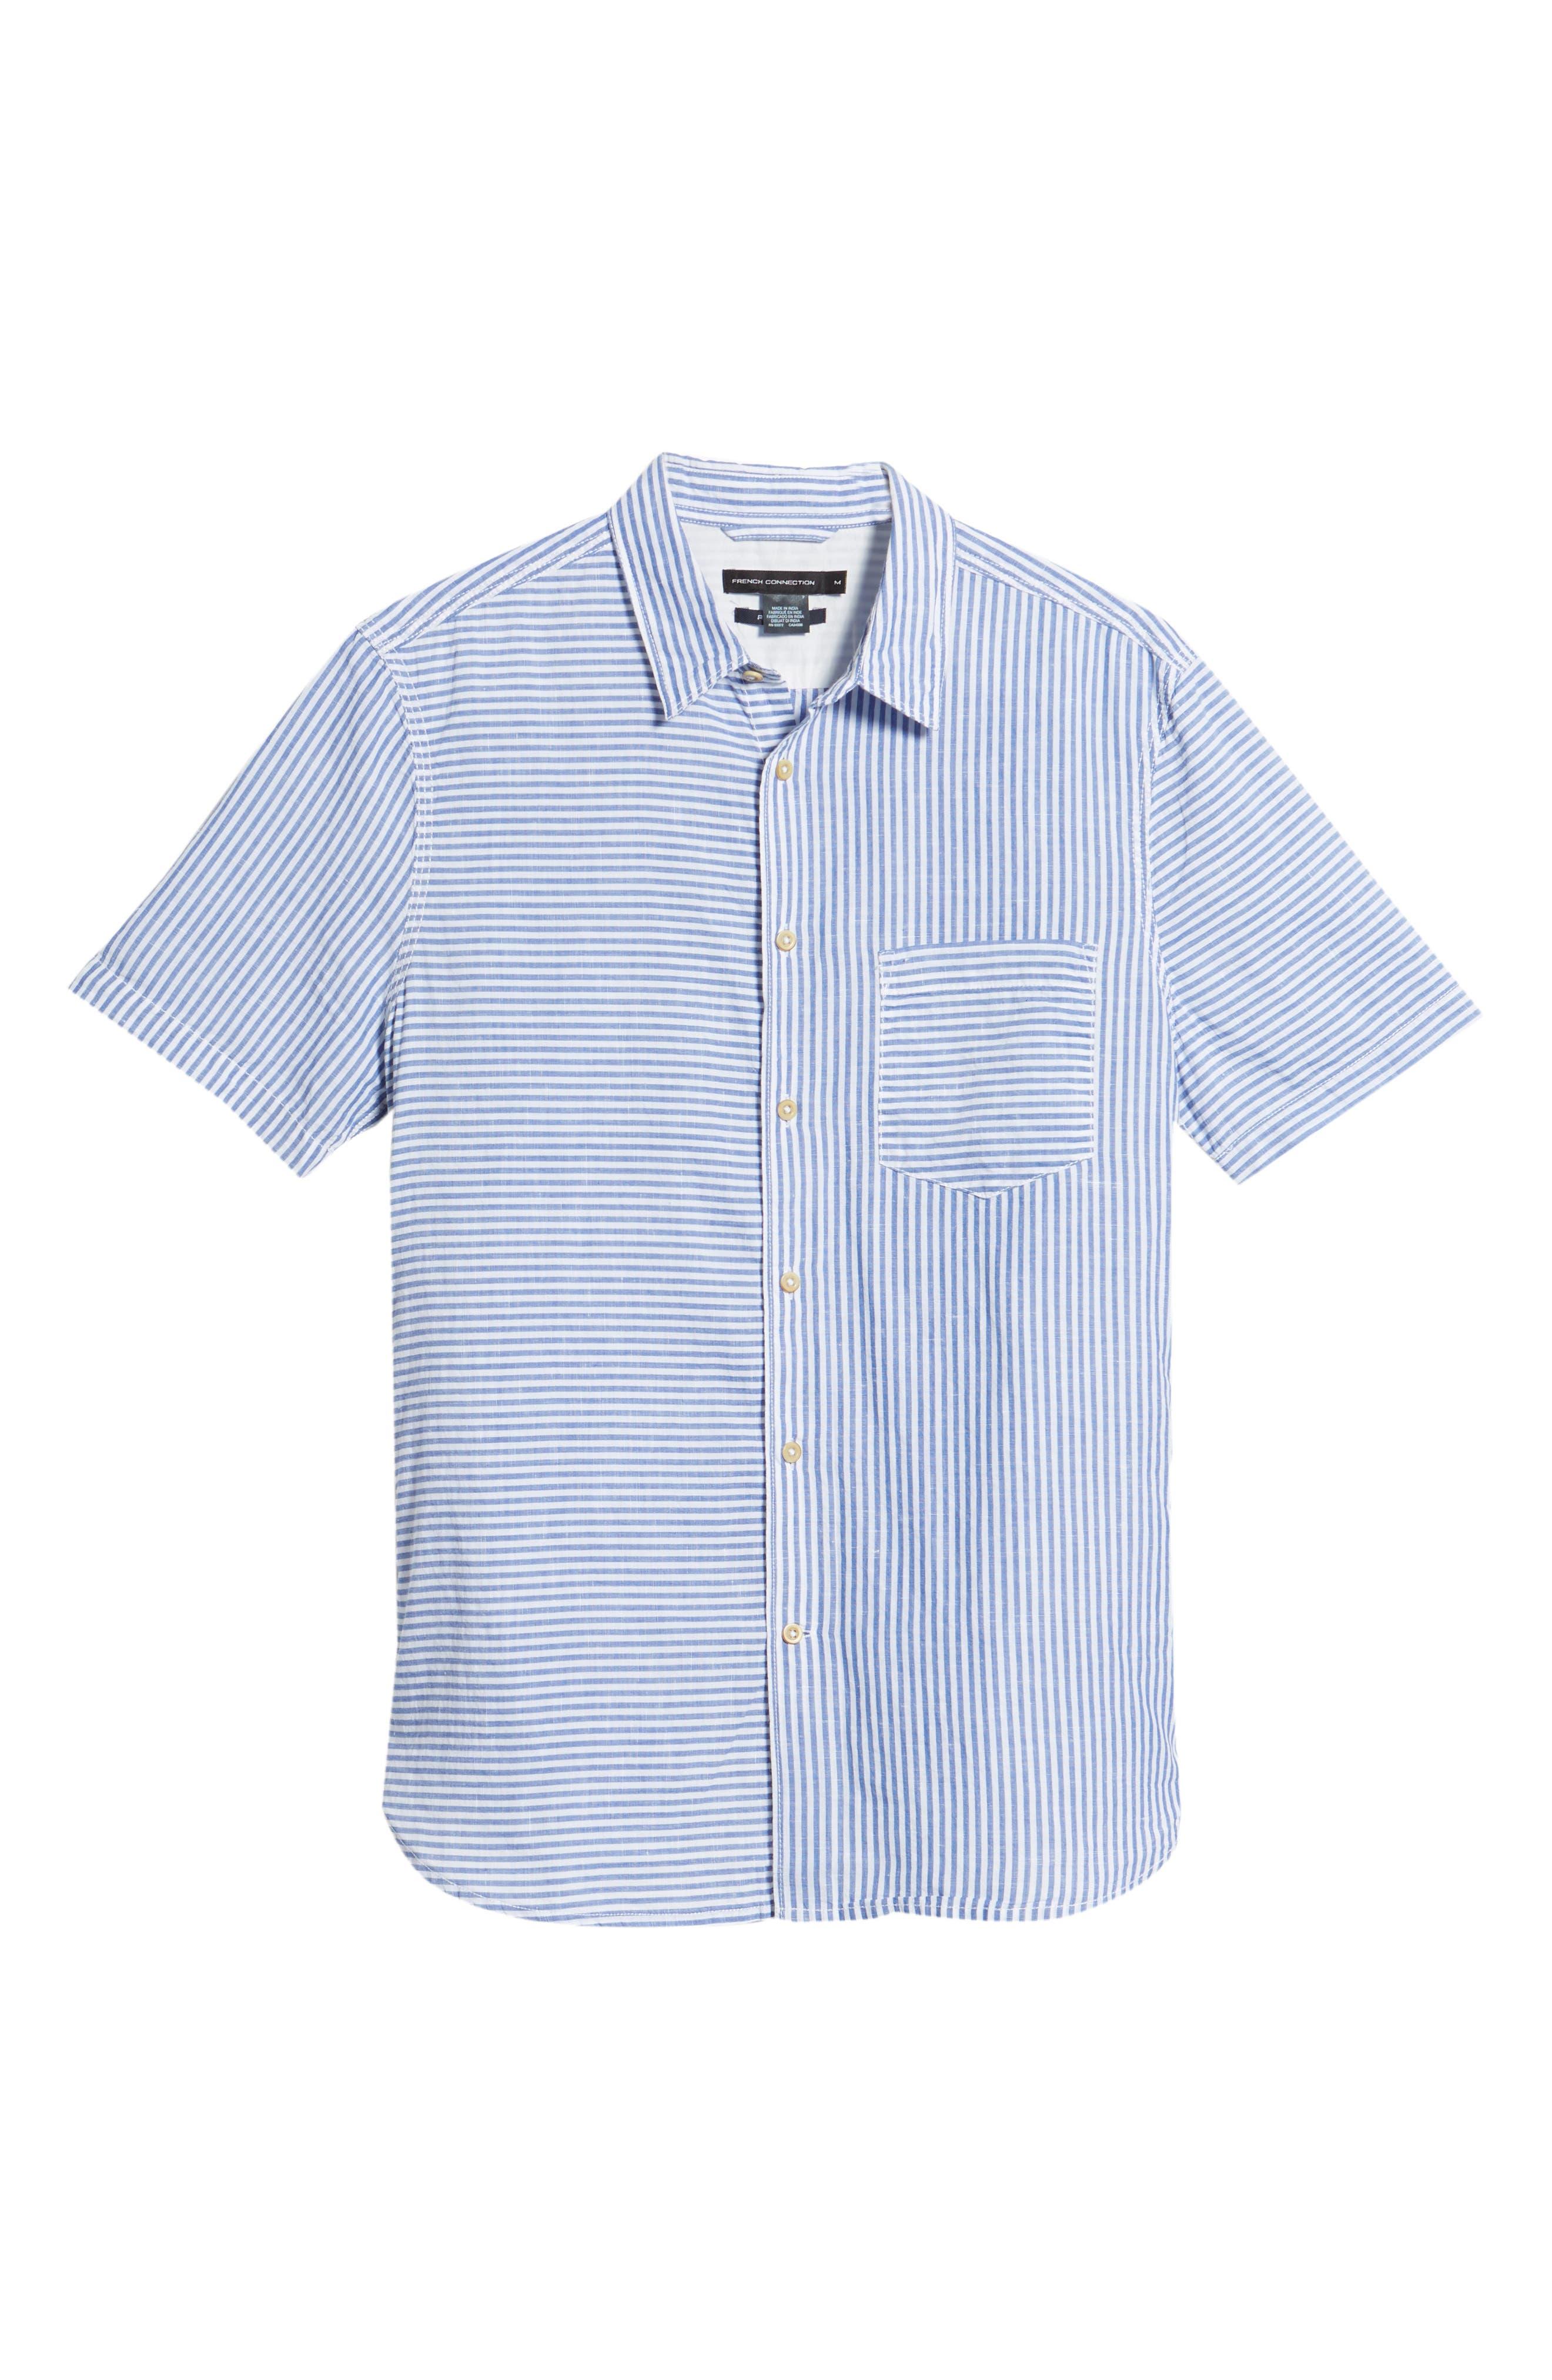 Stripe Chambray Cotton & Linen Sport Shirt,                             Alternate thumbnail 6, color,                             RICH BLUE